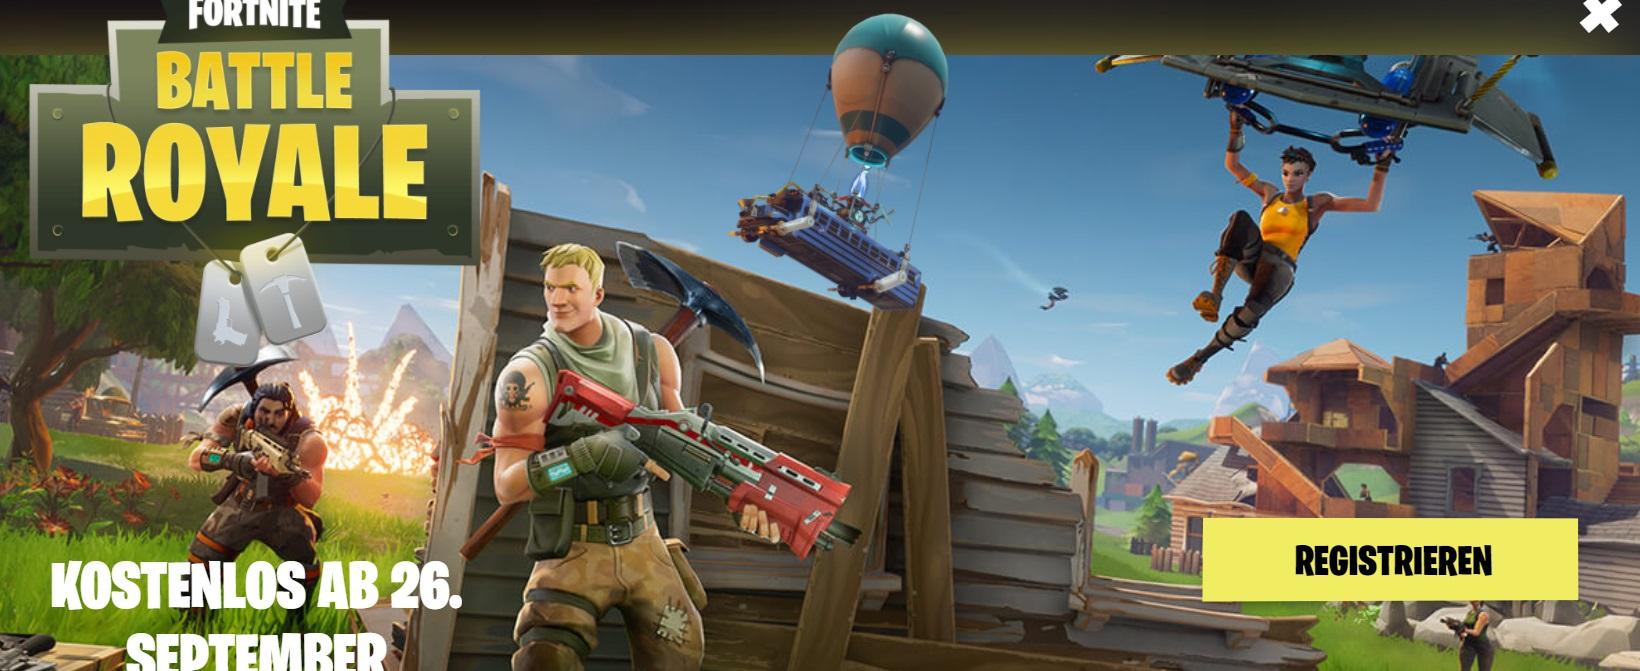 Fortnite: Battle Royale komplett kostenlos ab 26.09. [PC] [PS4] [Xbox] [Mac]